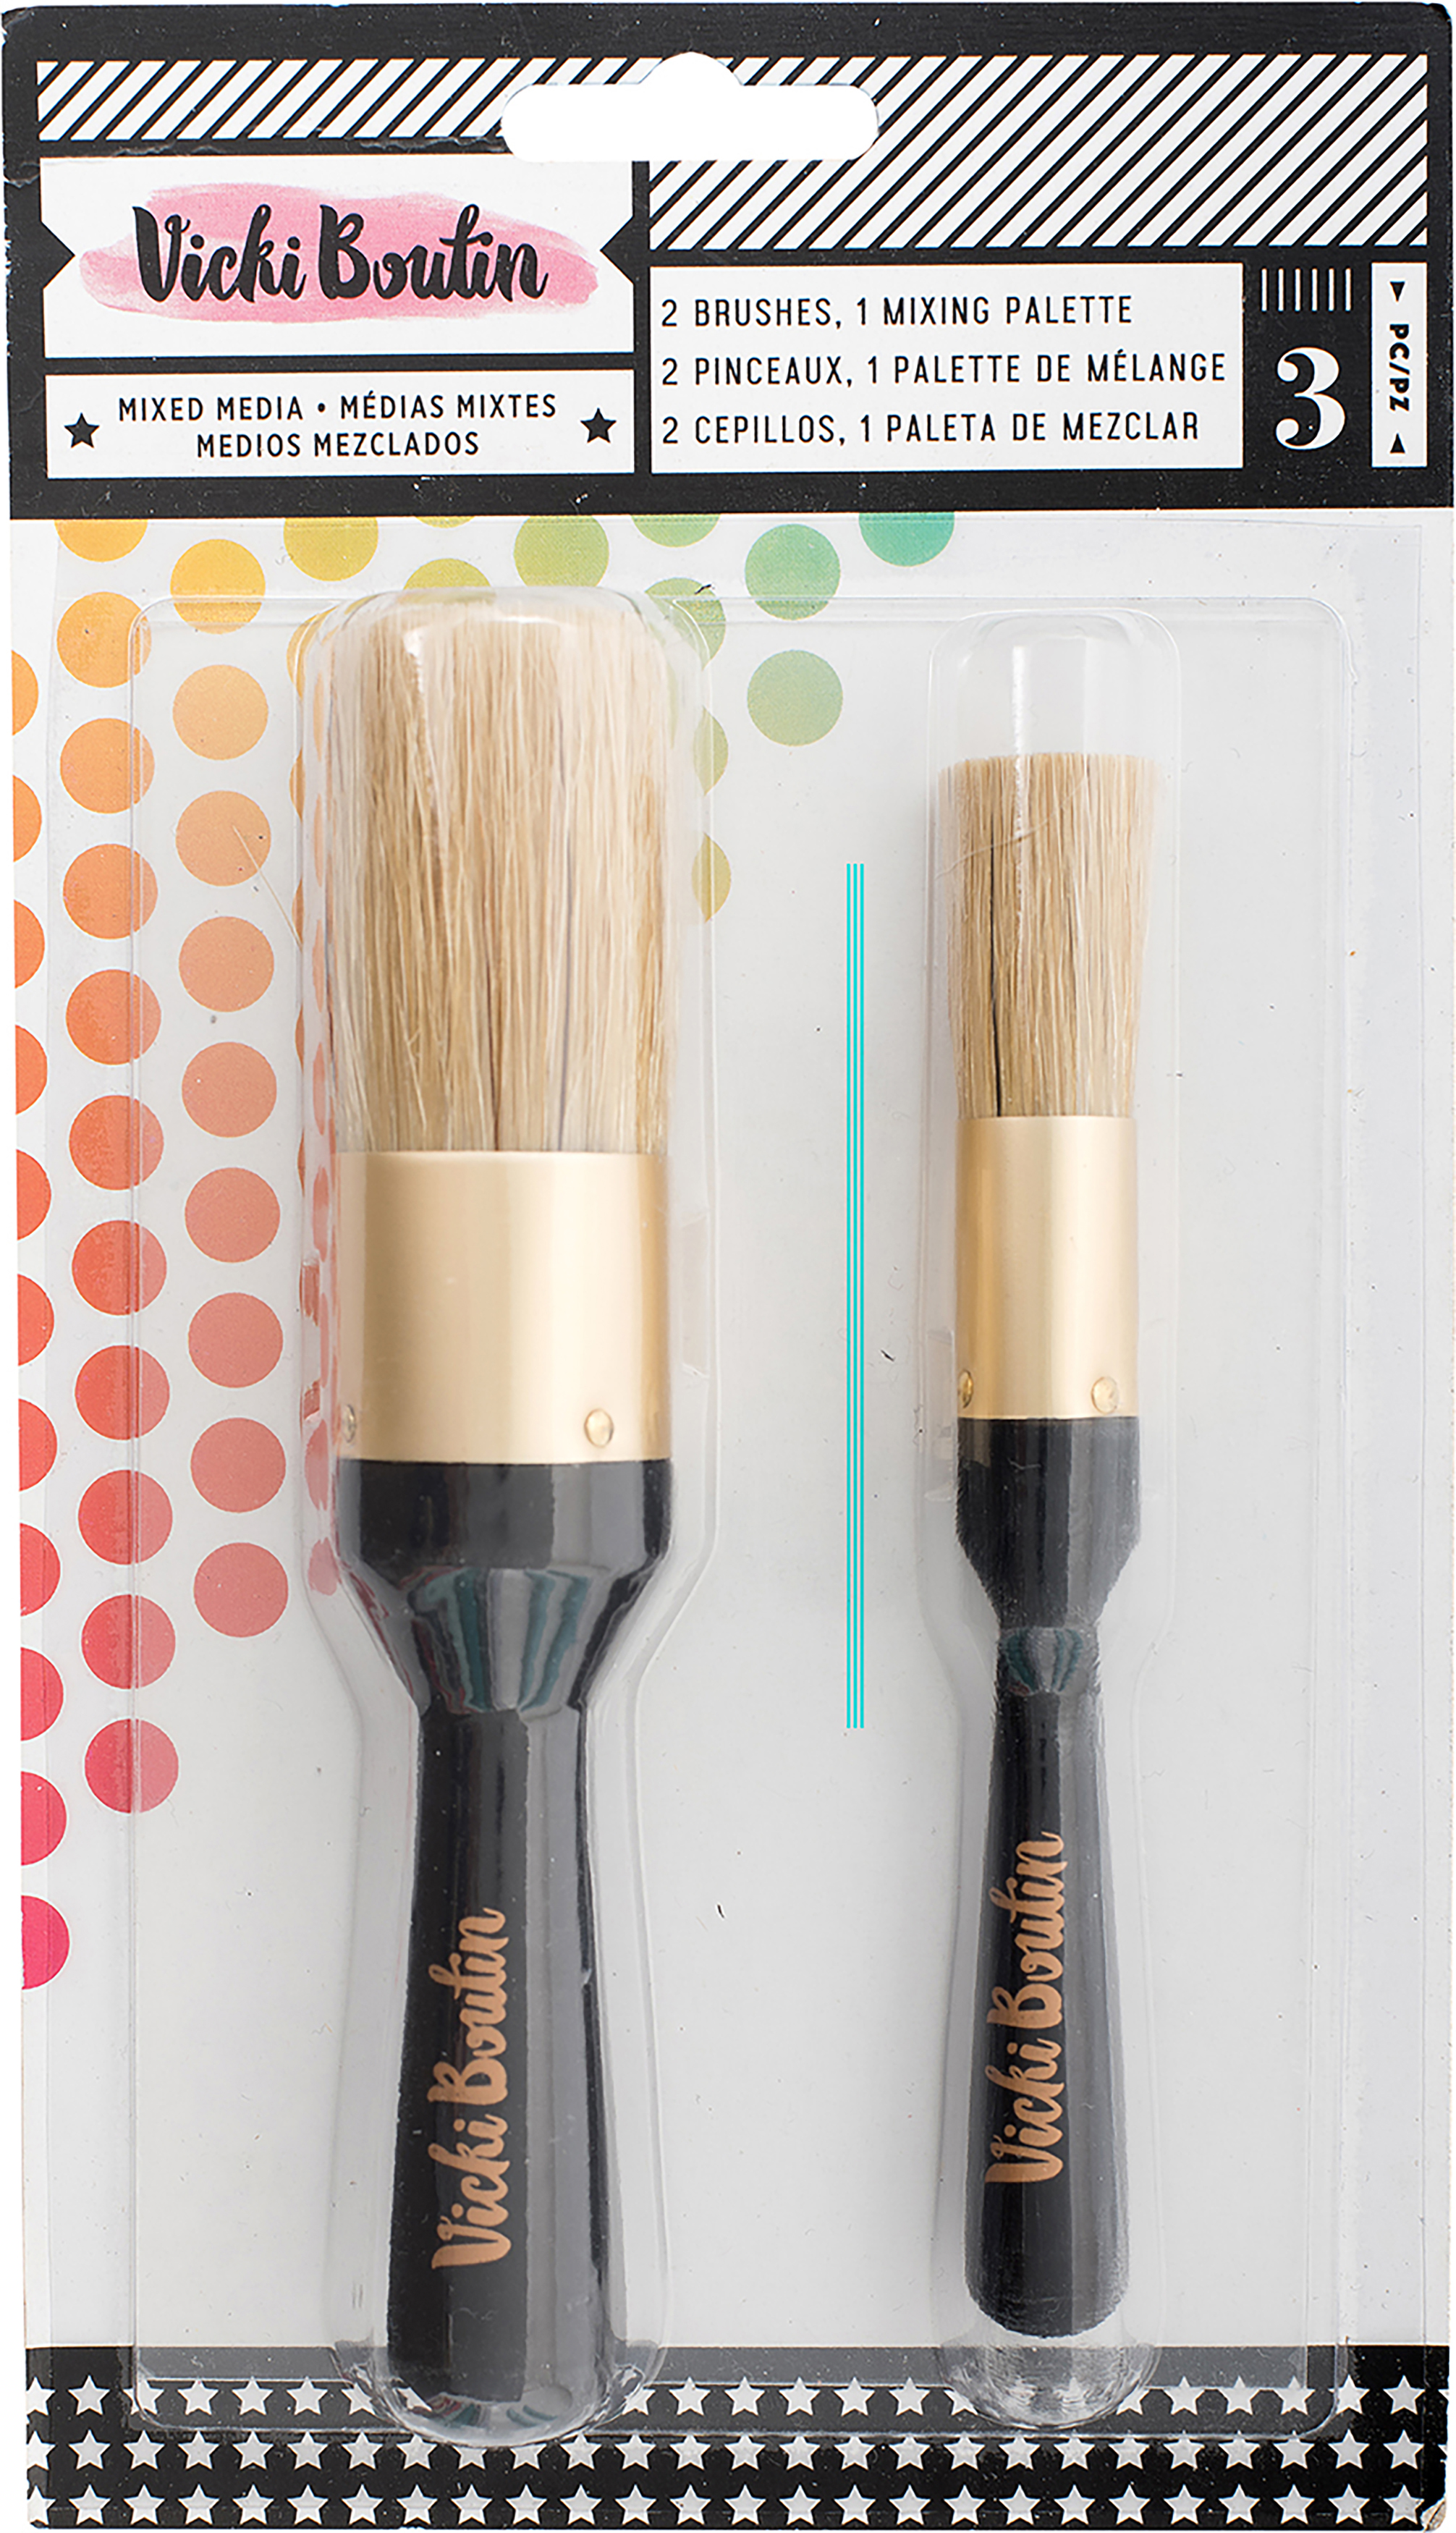 Vicki Boutin Mixed Media Stencil Brush Set -All The Good Things